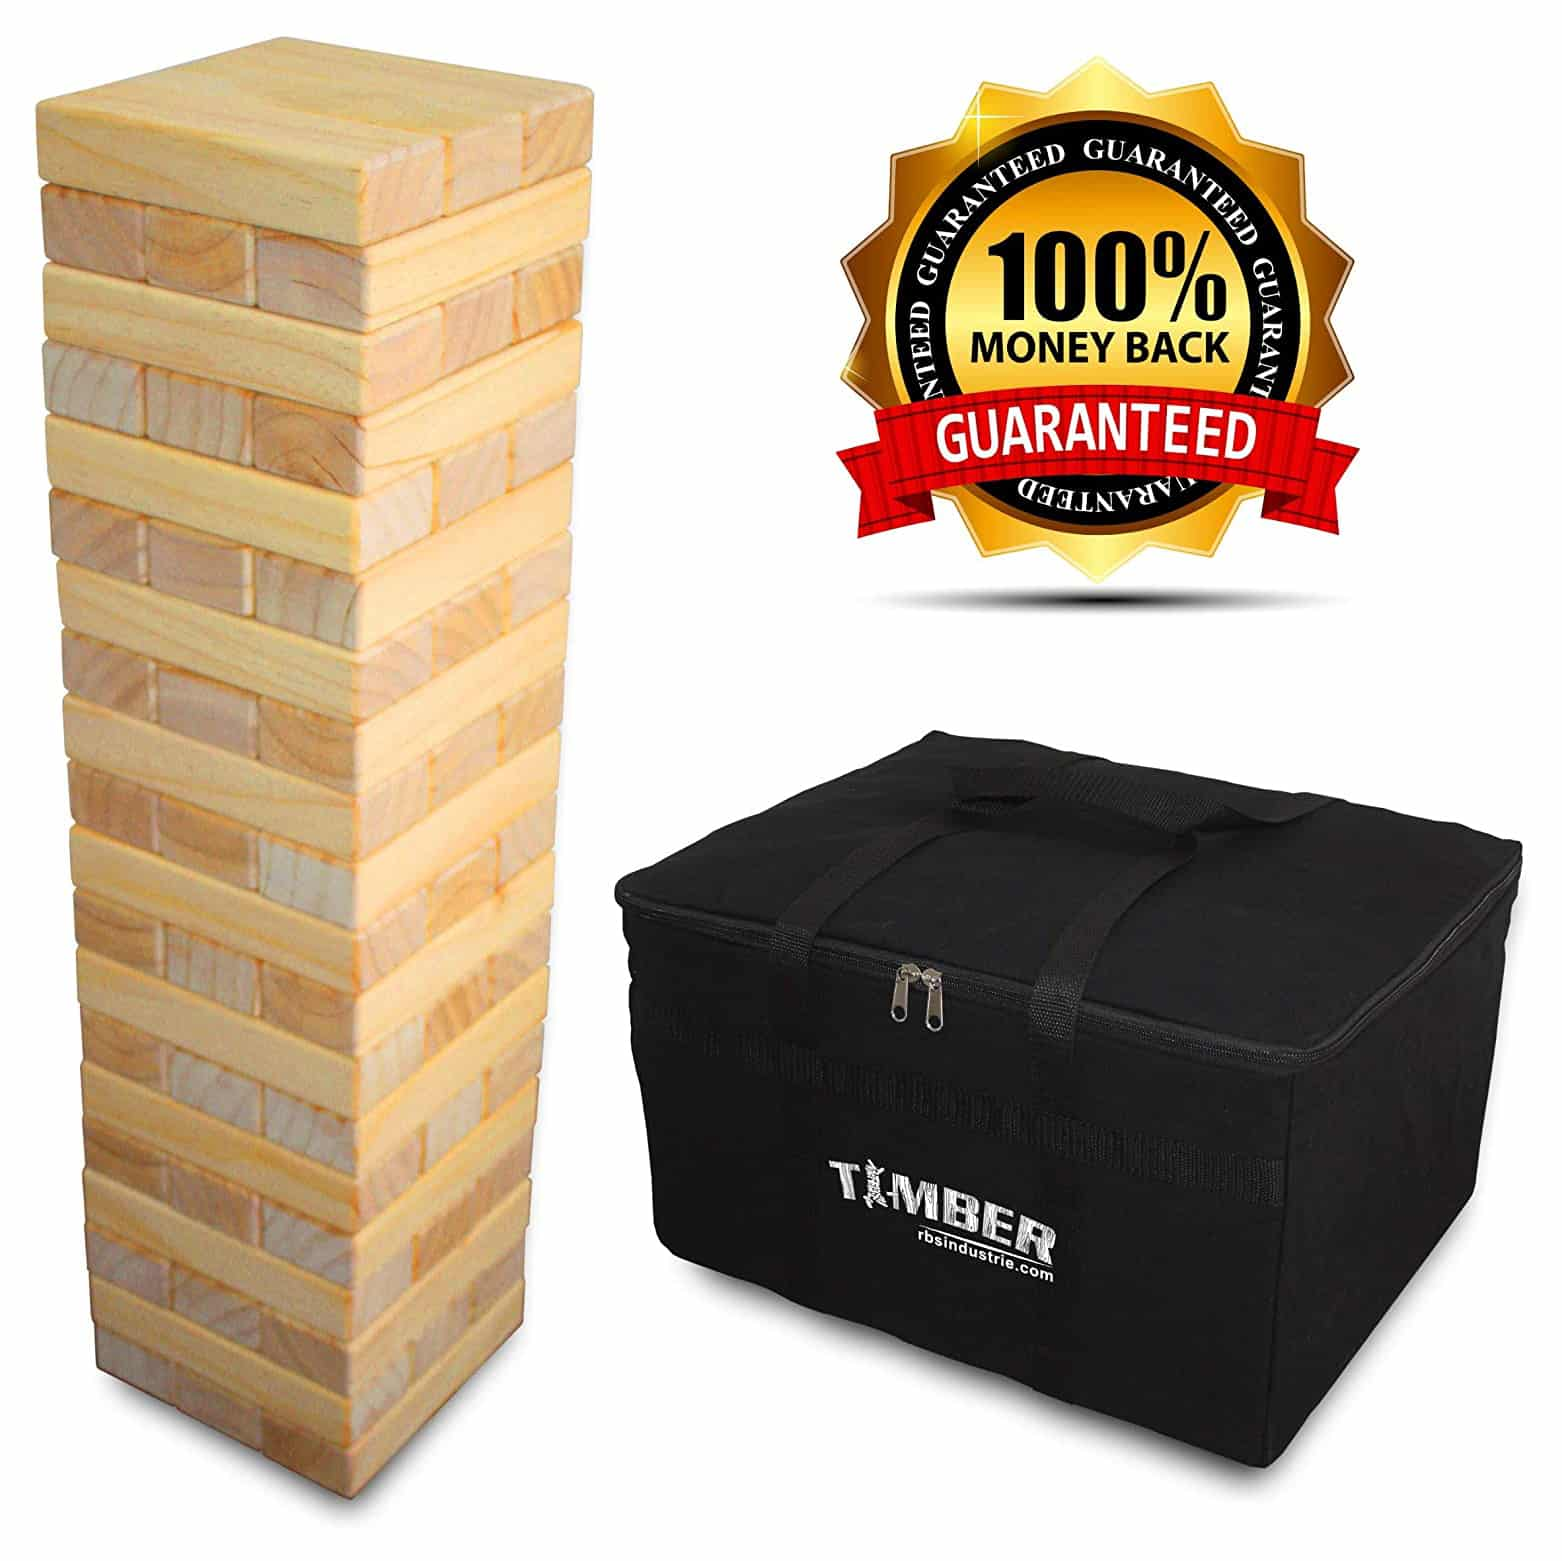 TIMBER Jumbo Size Wood Game